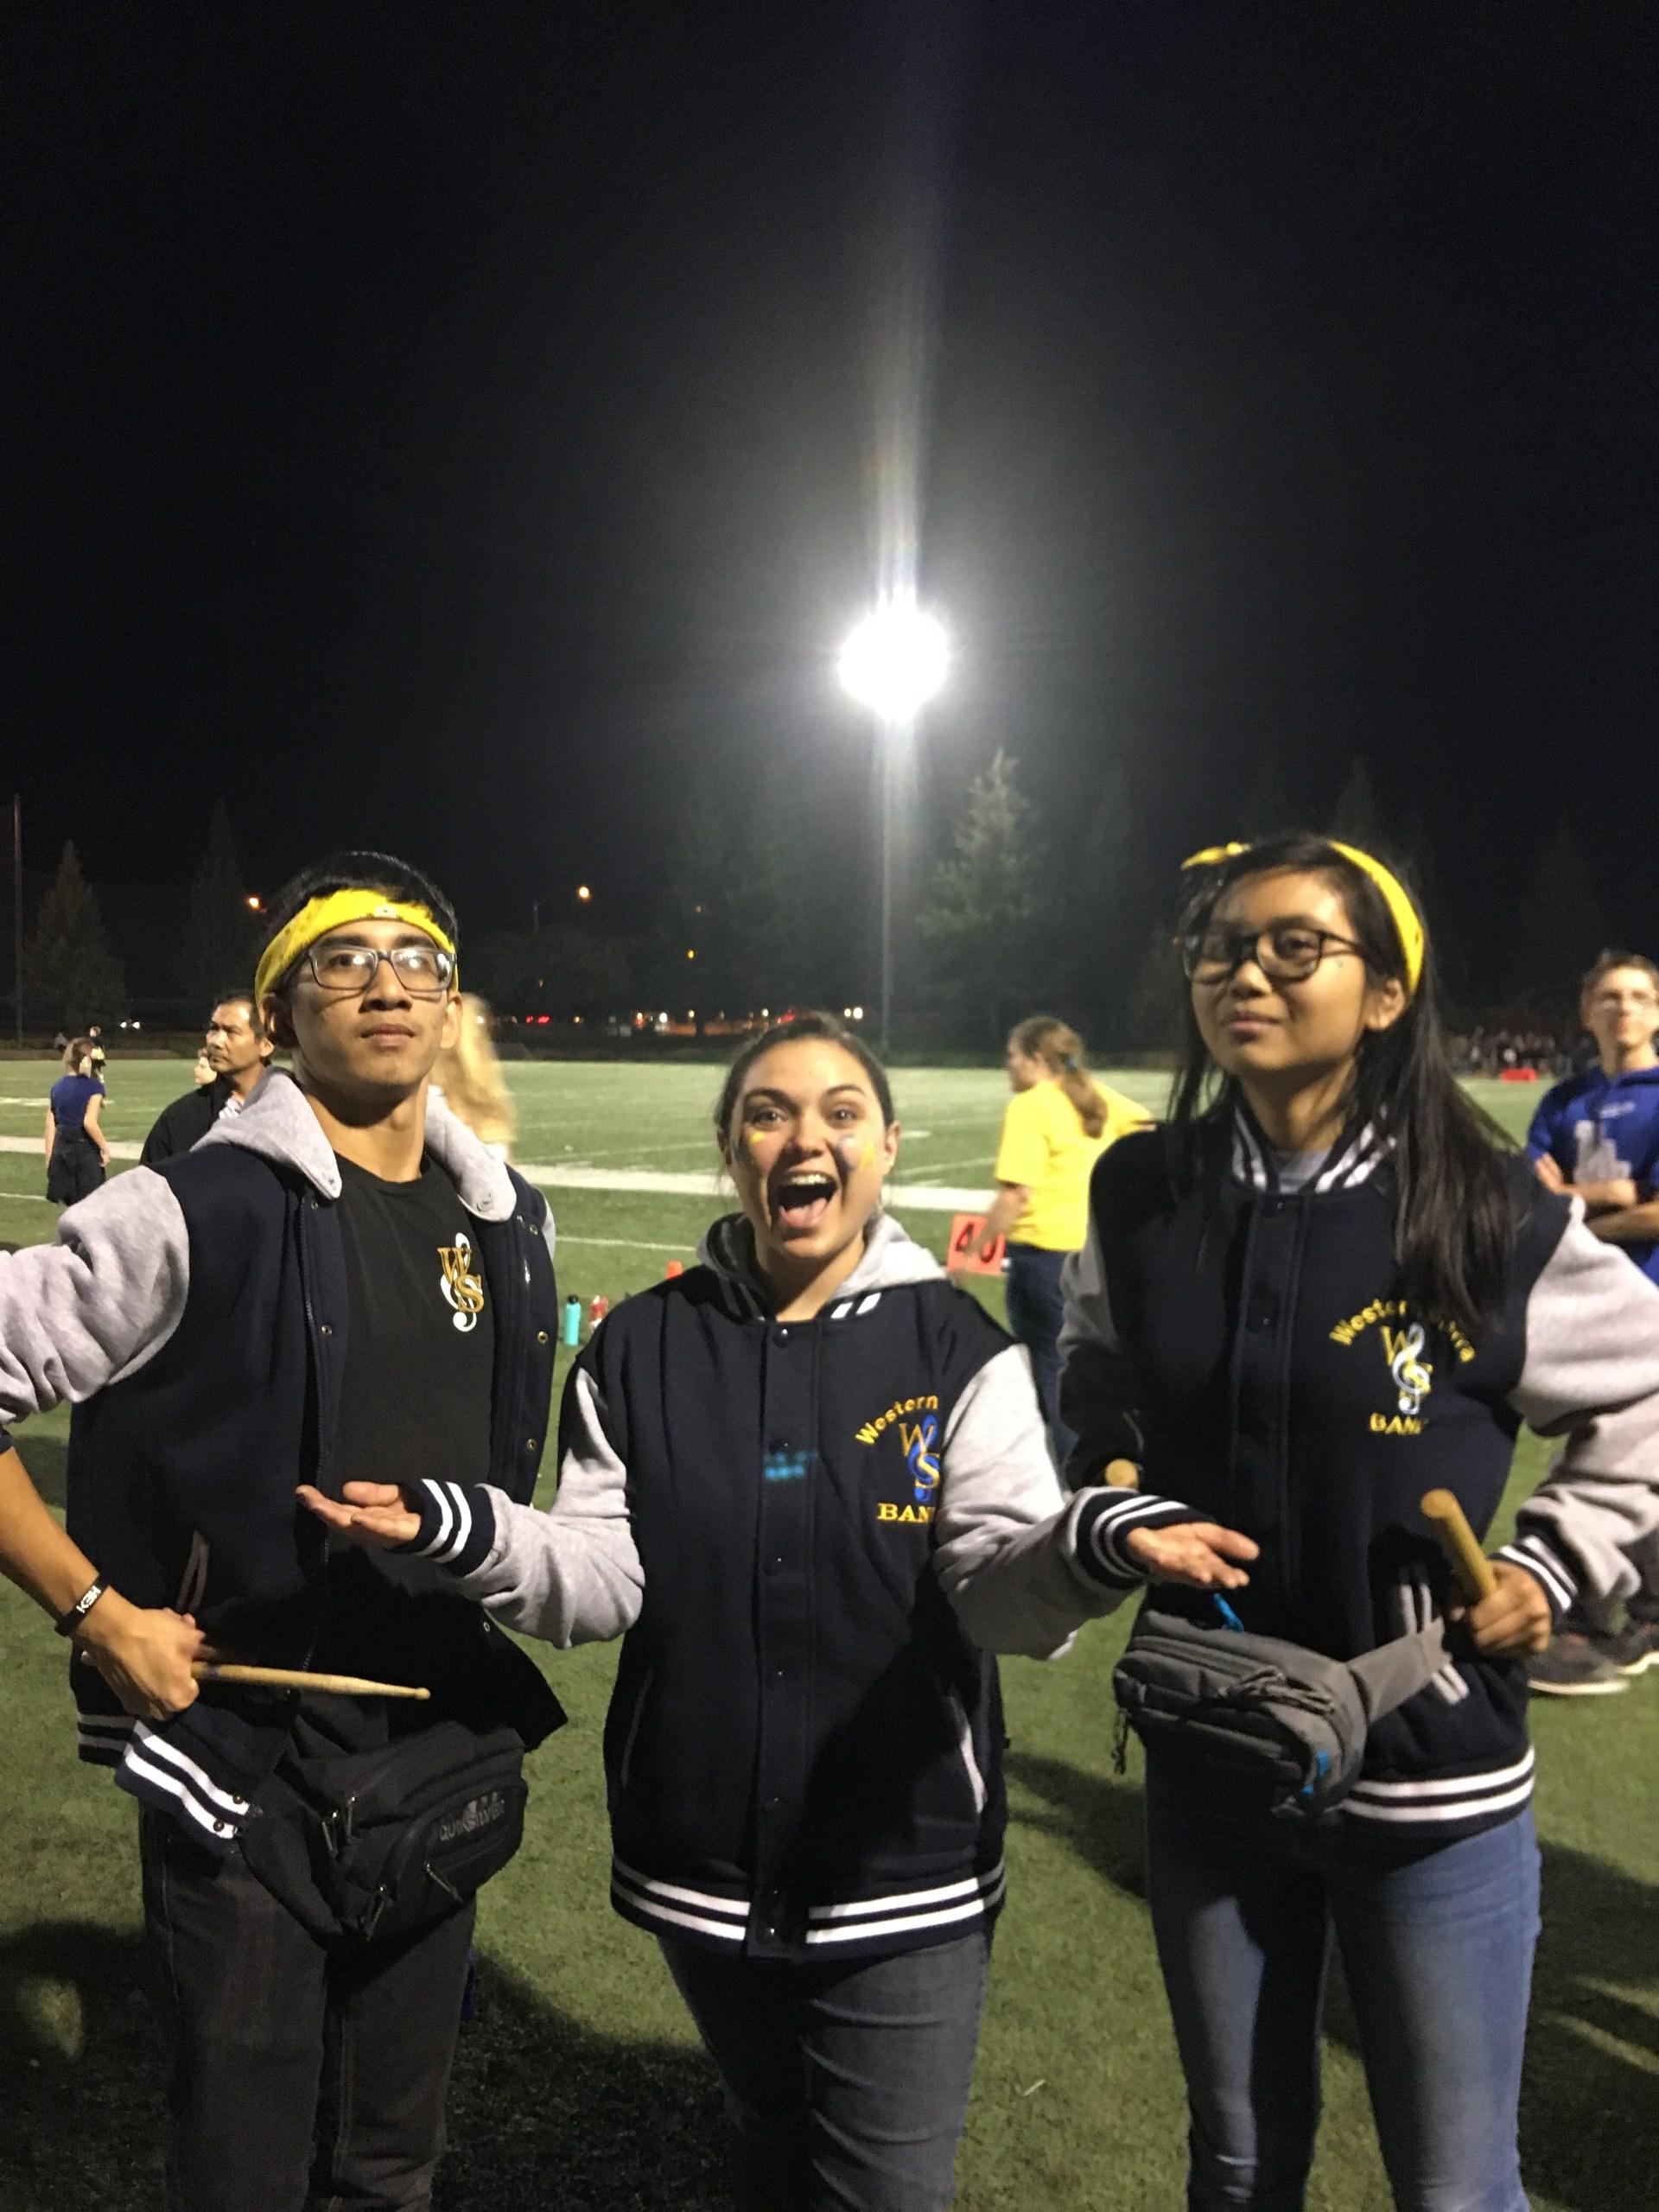 Student leadership at the Football Games!